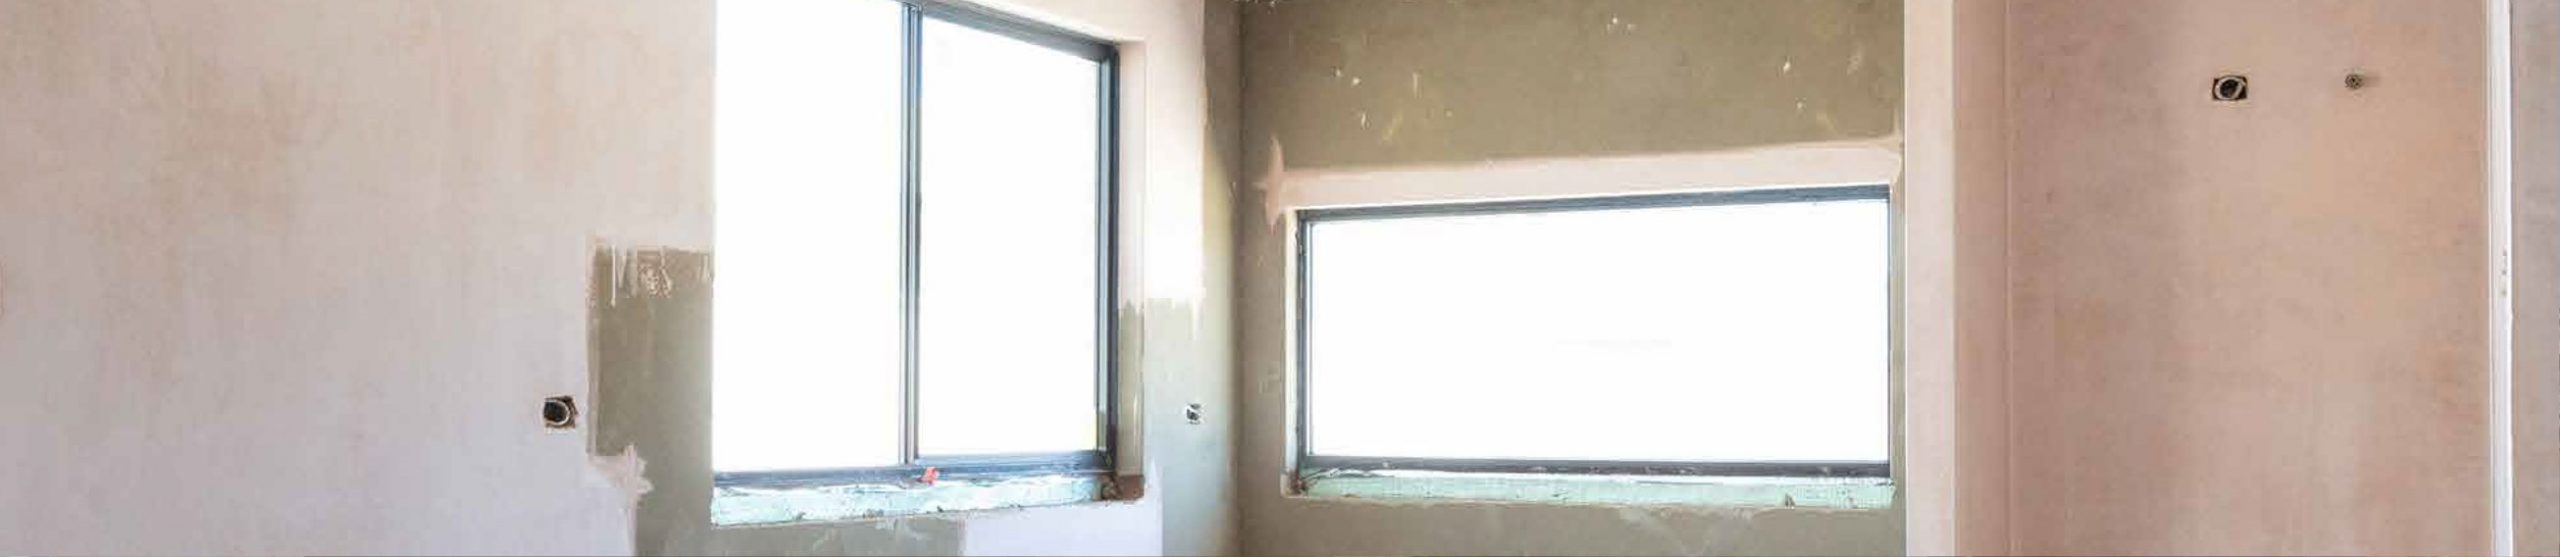 the-window-glazing-goes-in